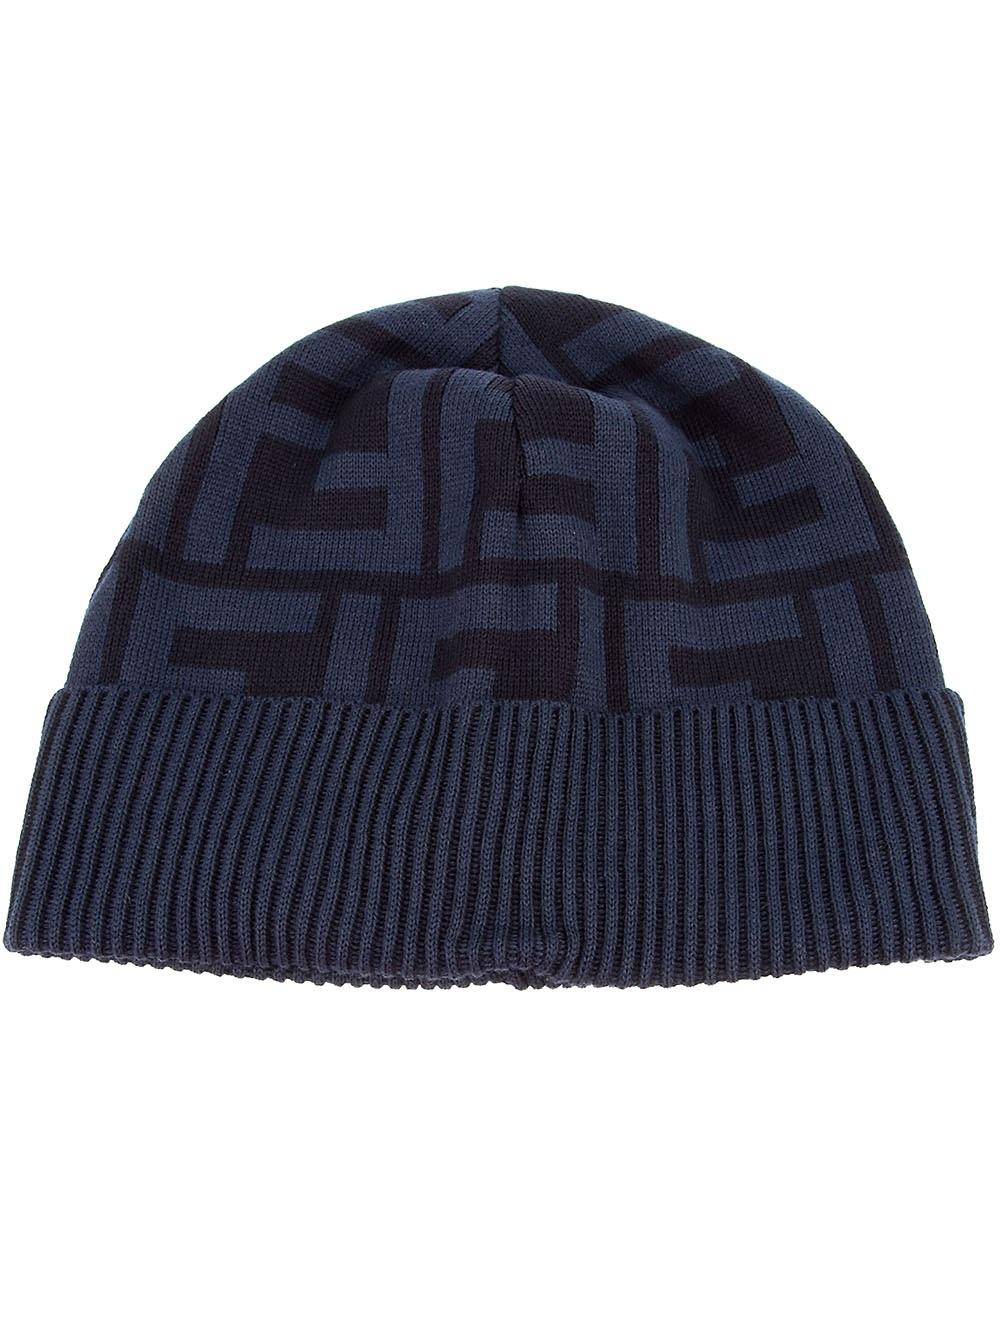 fendi monogrammed hat in blue for men